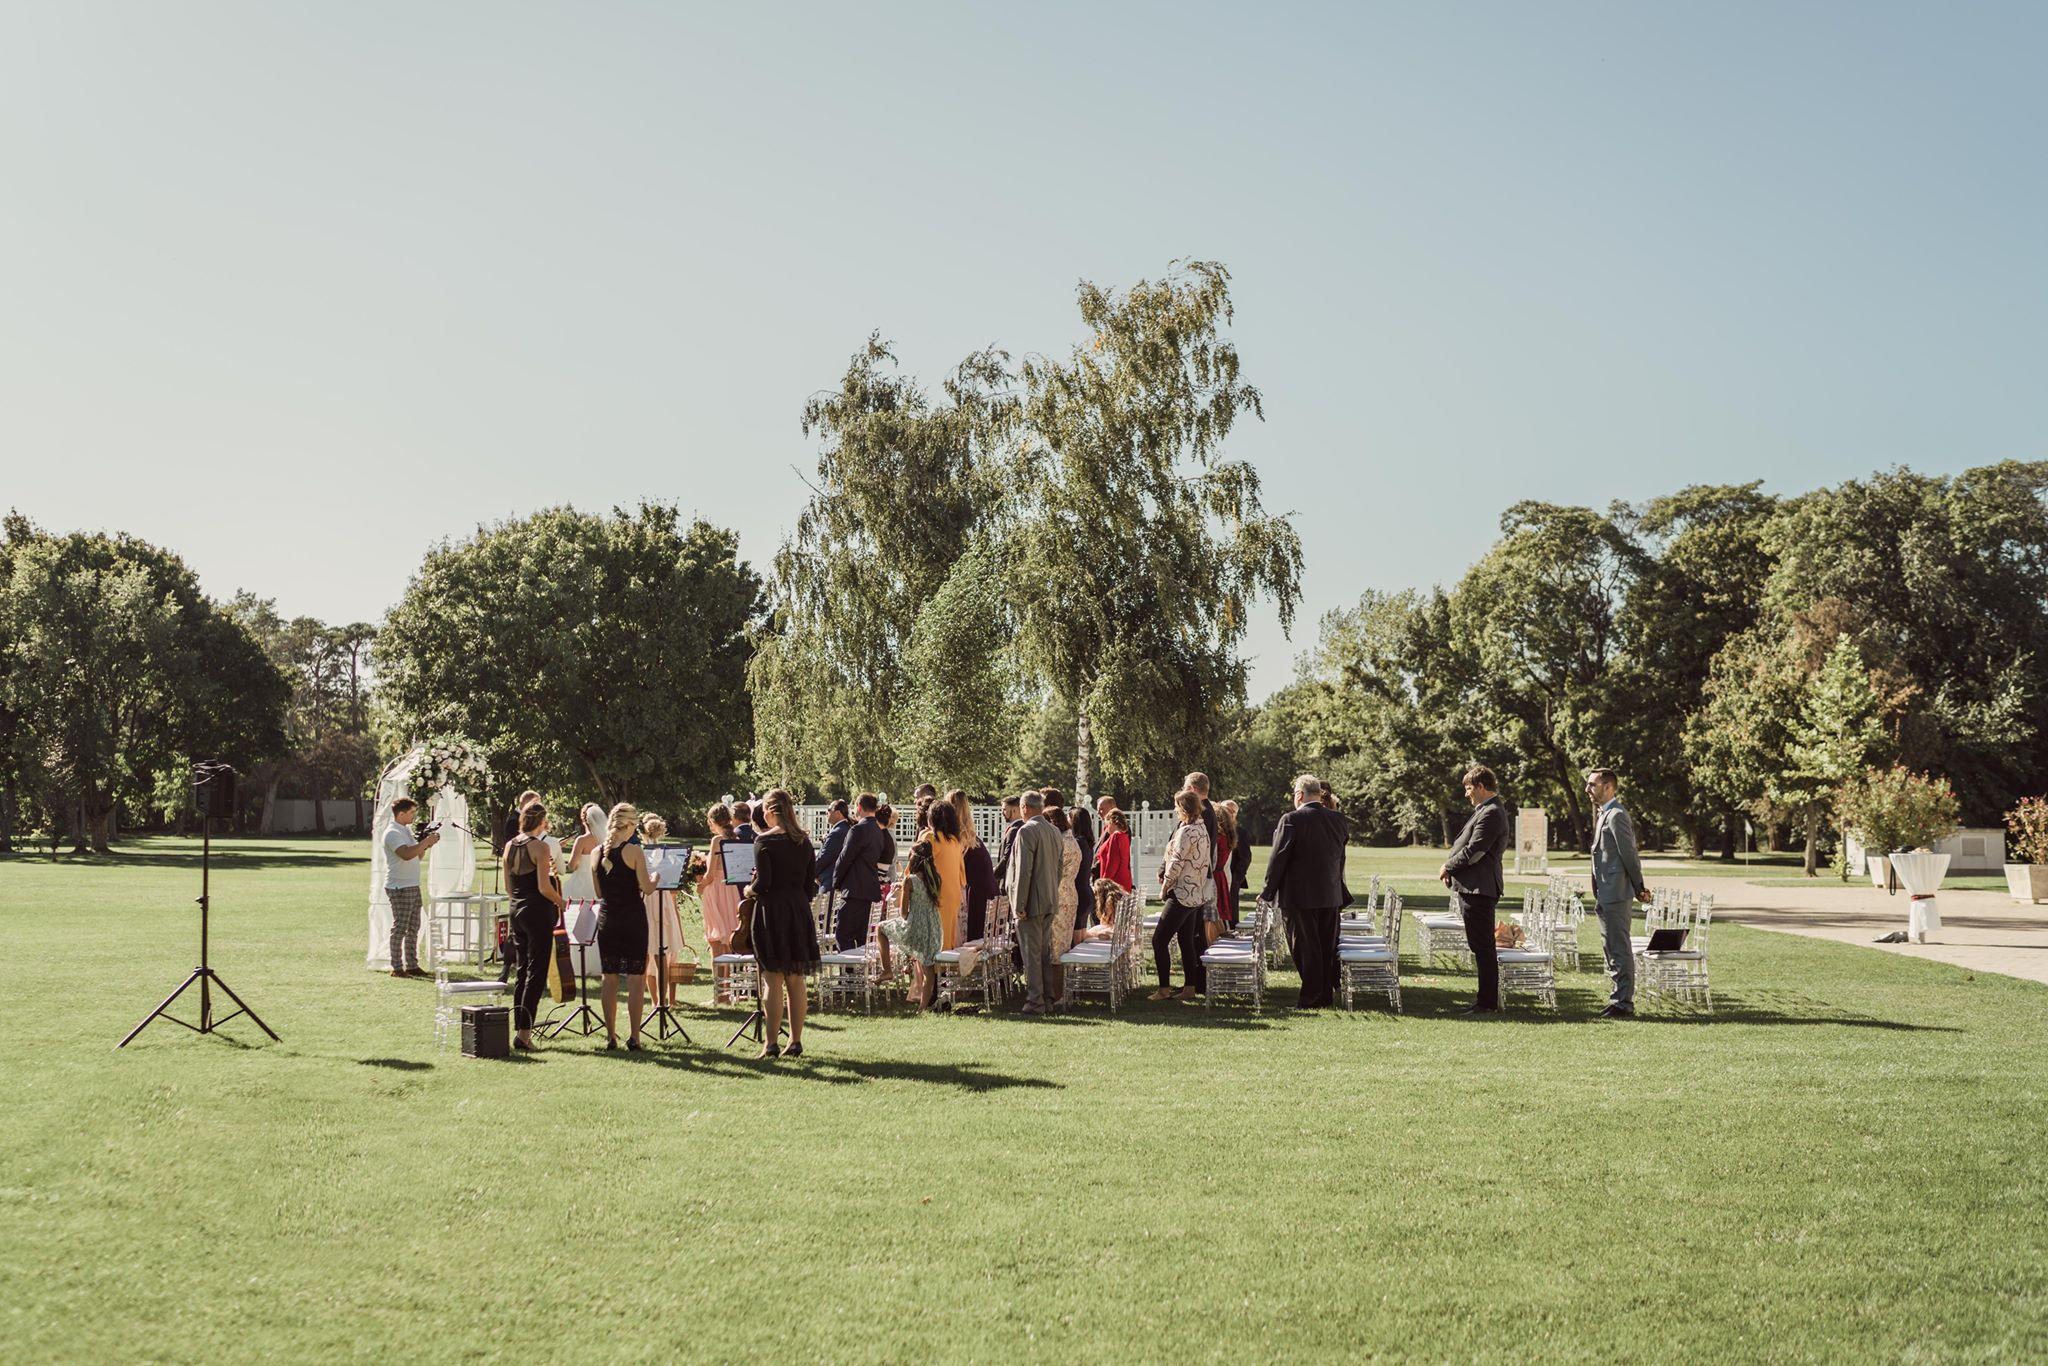 svadba-v-prirode-boho-weddingjpg